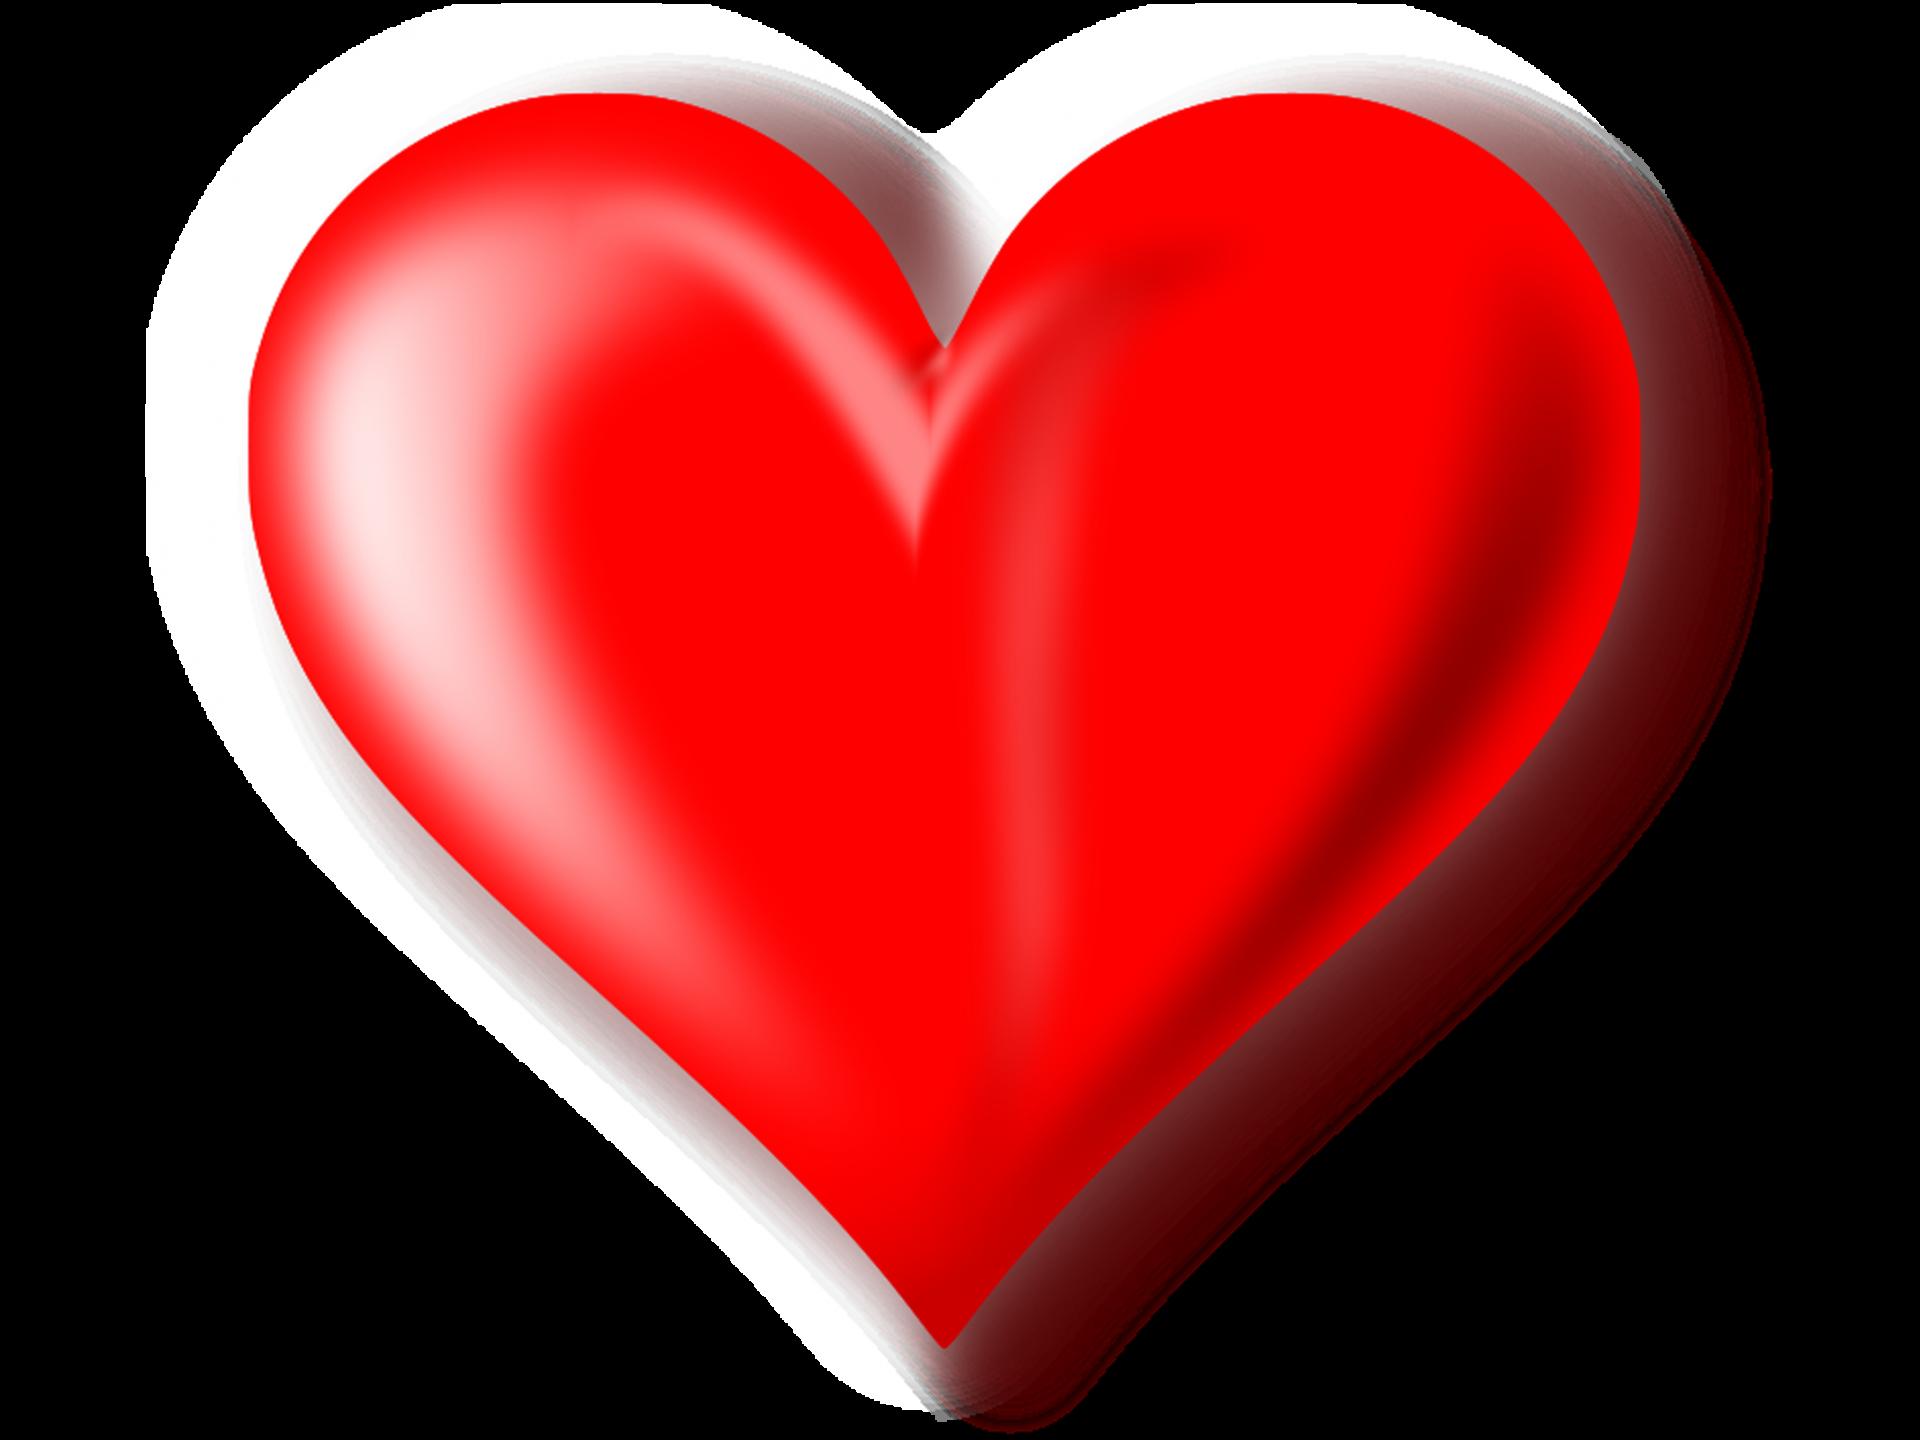 Download 3D Red Heart Transparent Background HQ PNG Image ...